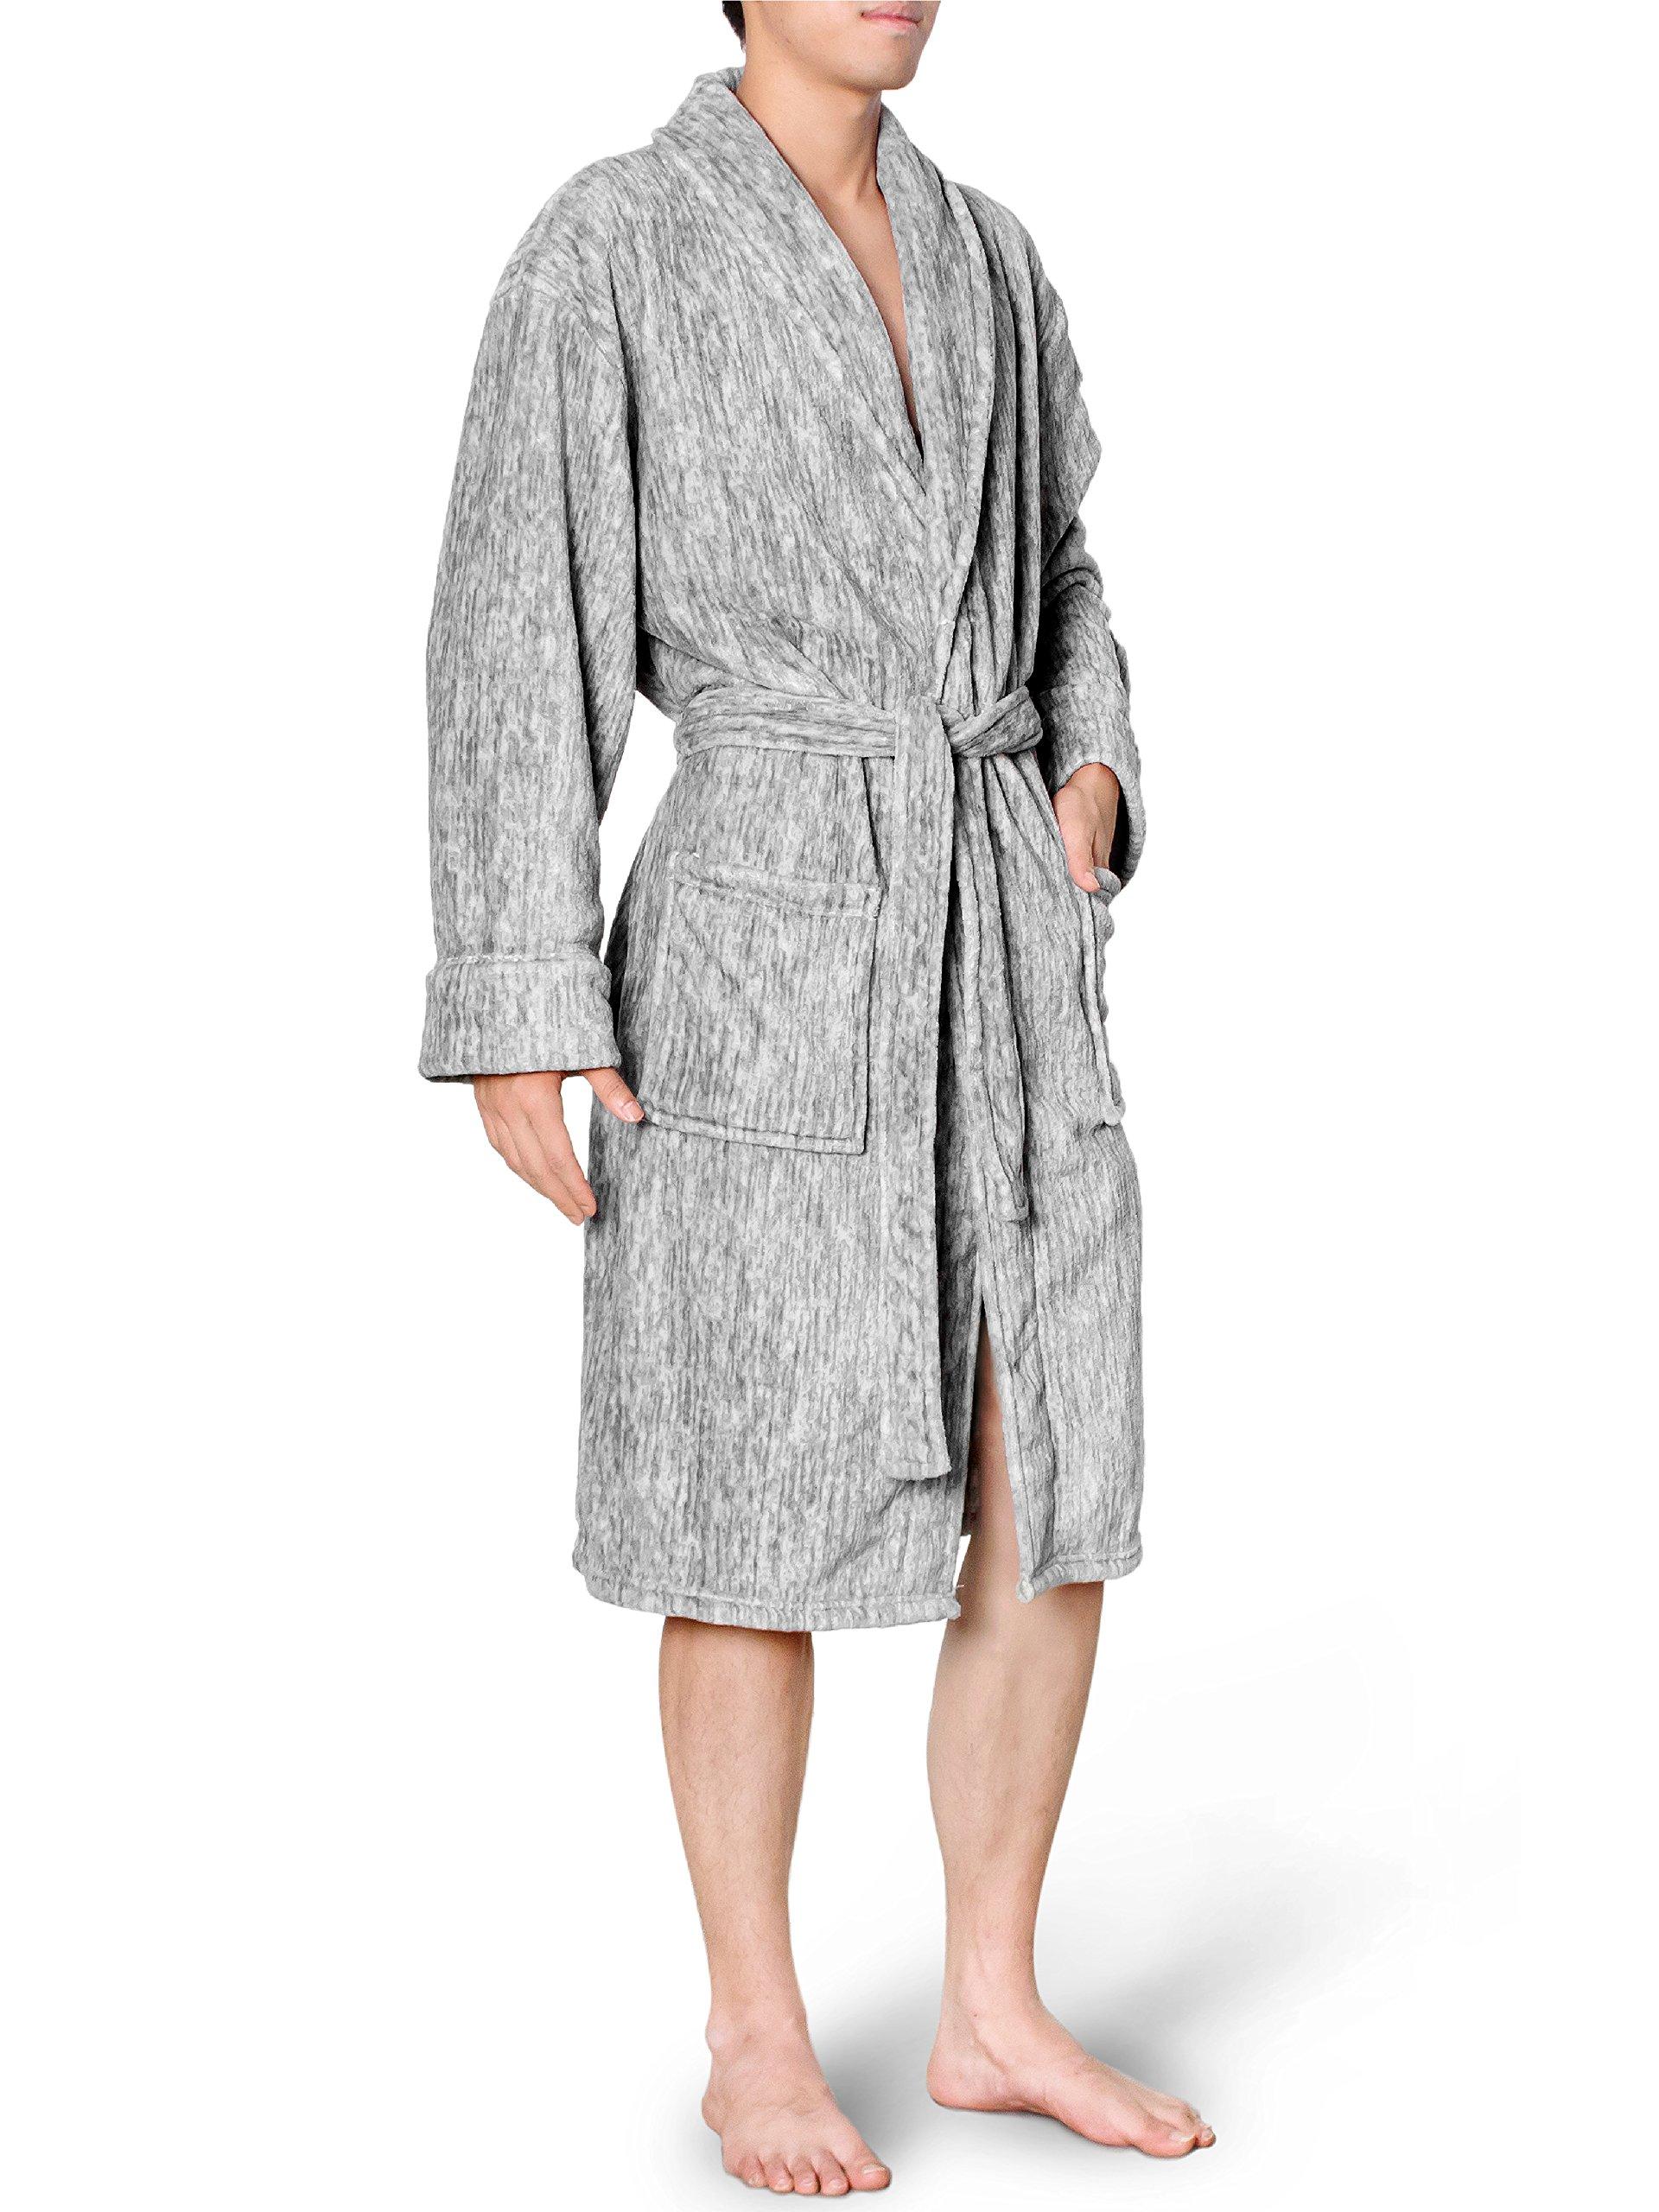 Premium Mens Fleece Robe | Soft Lightweight Bathrobe | Plush Warm Spa Robe